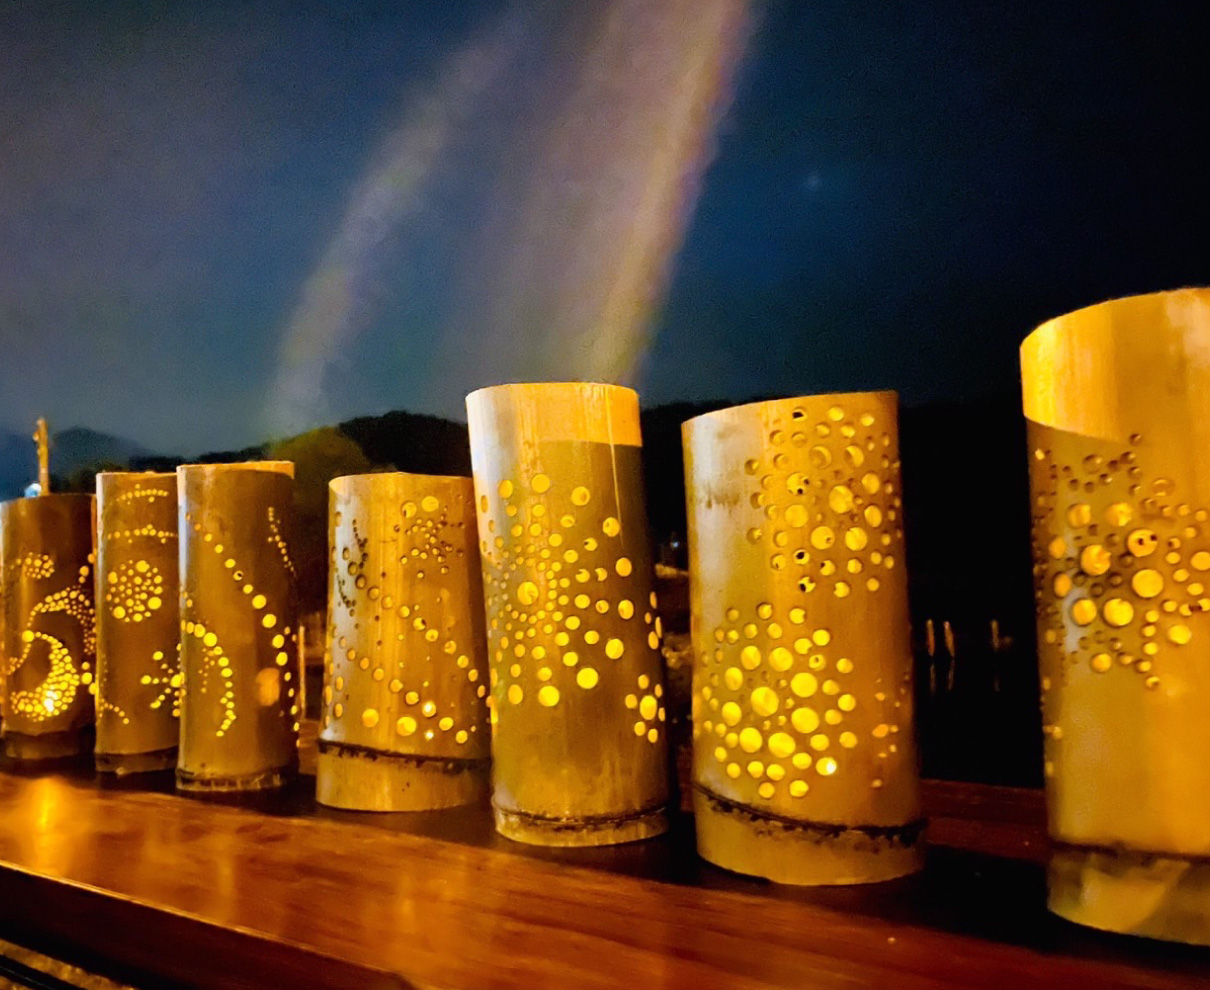 花火と竹灯り|若狭町小川漁港